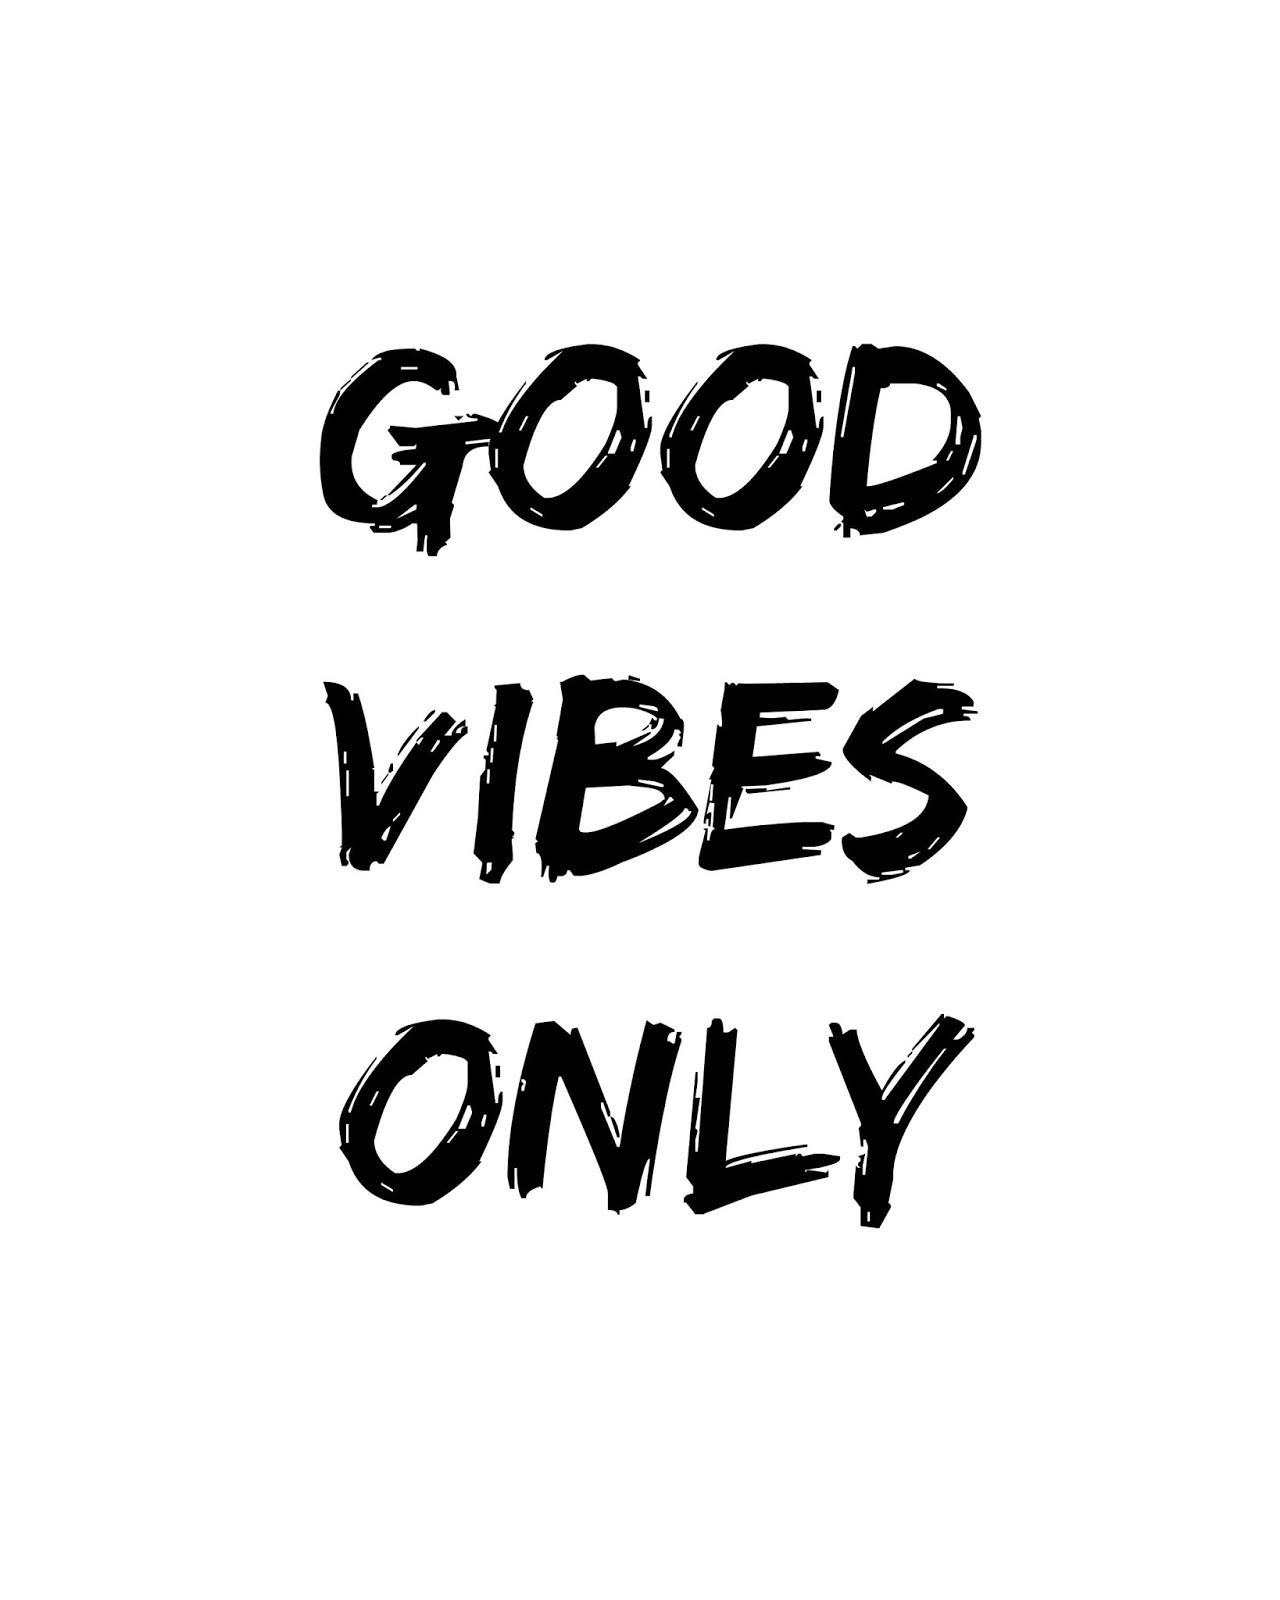 CJO Photo: Printable Black and White Art 8x10: Good Vibes Only